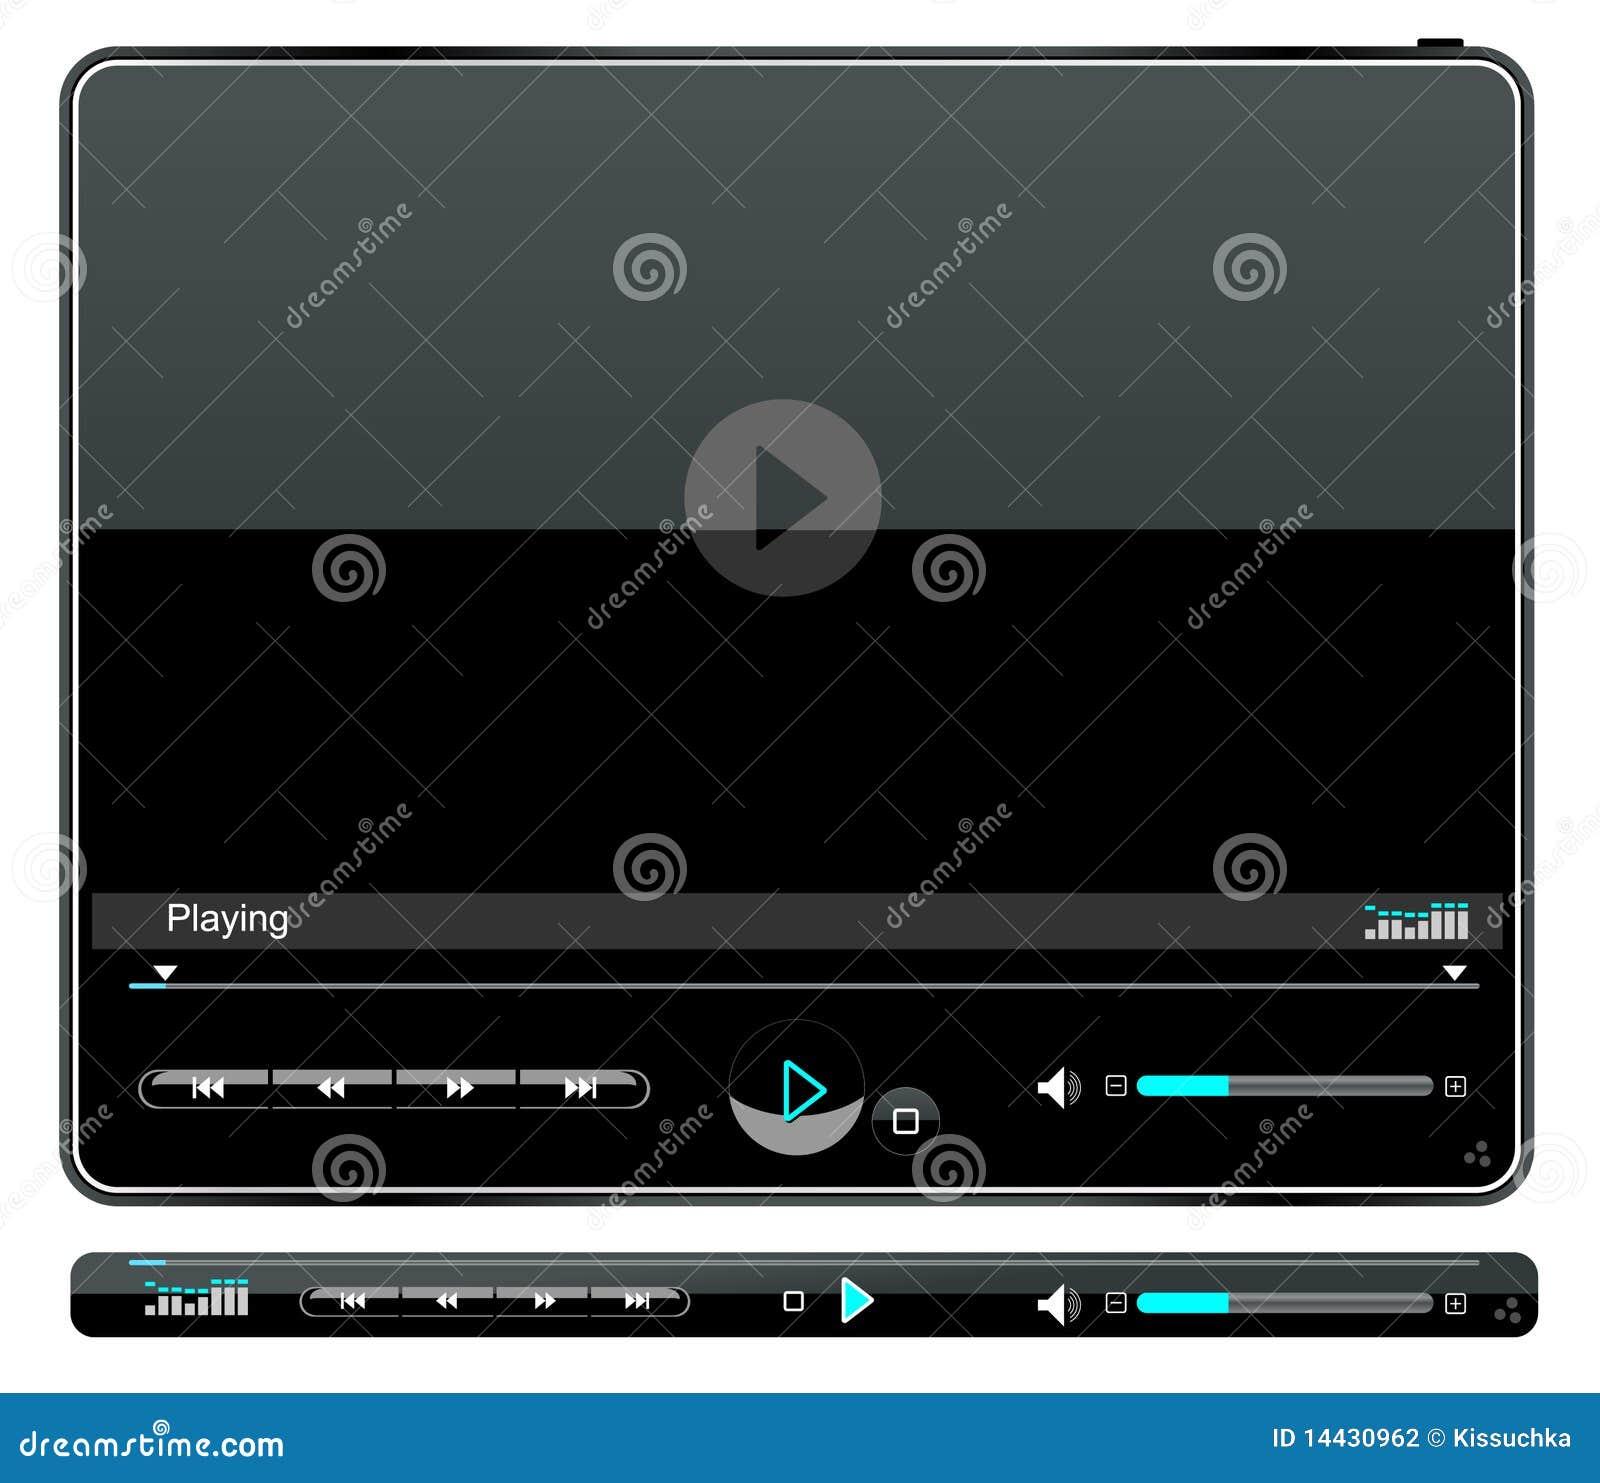 Multimedia-Spielerschnittstelle